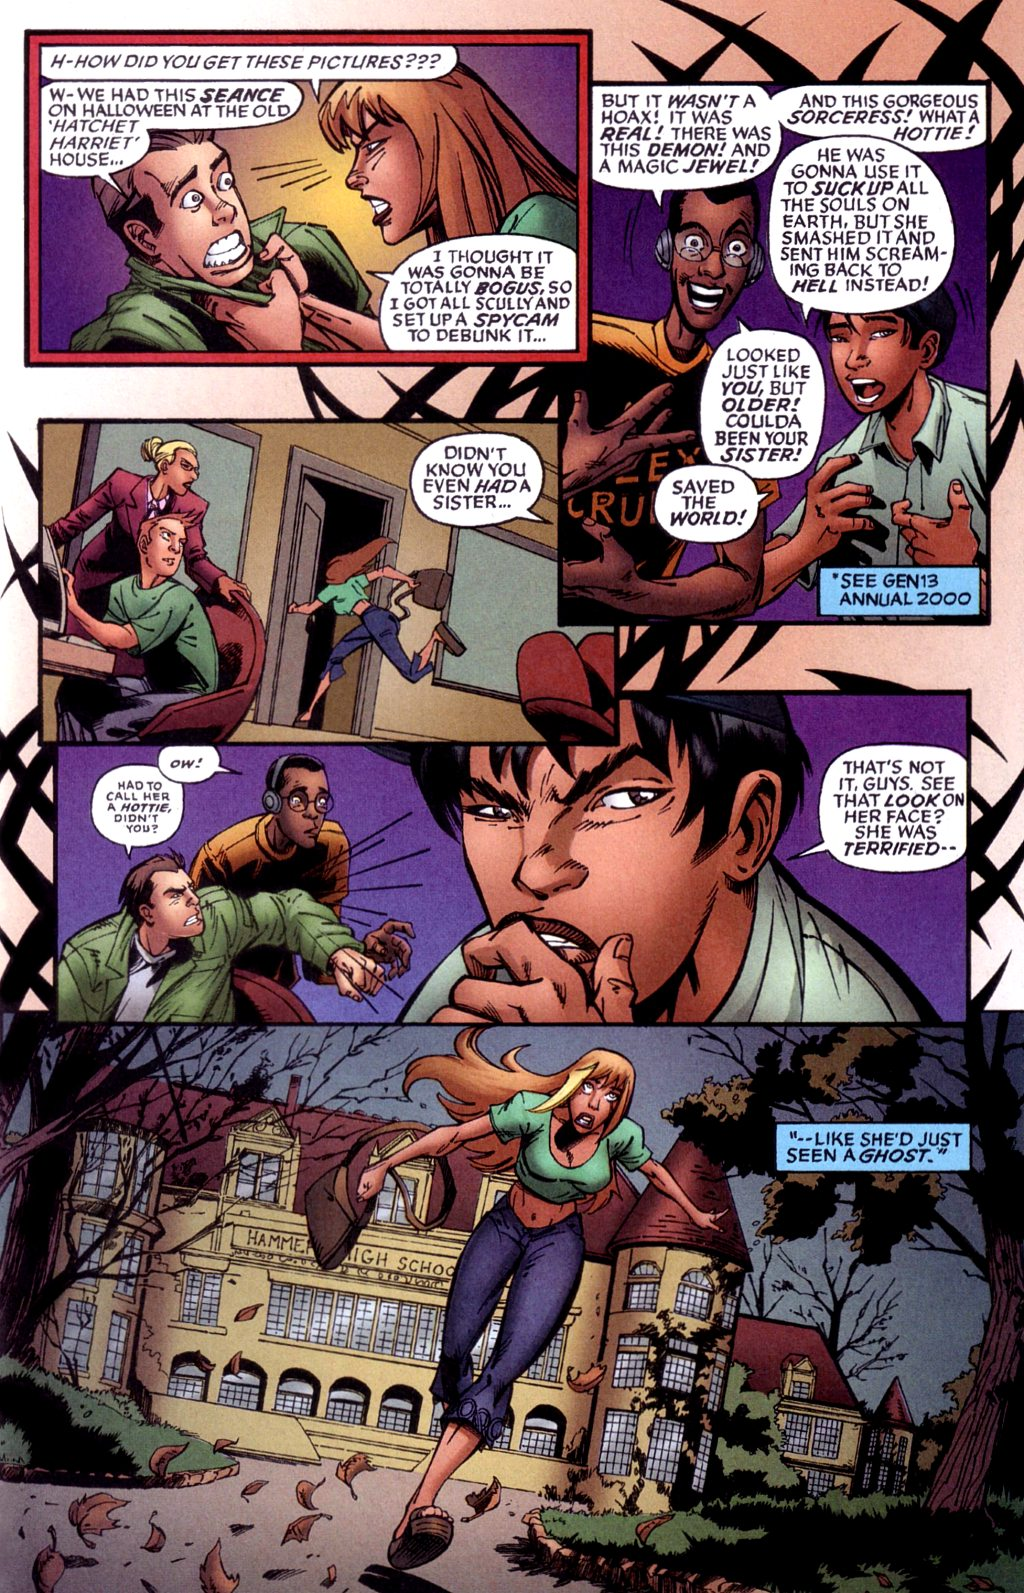 Read online Jezebelle comic -  Issue #1 - 14